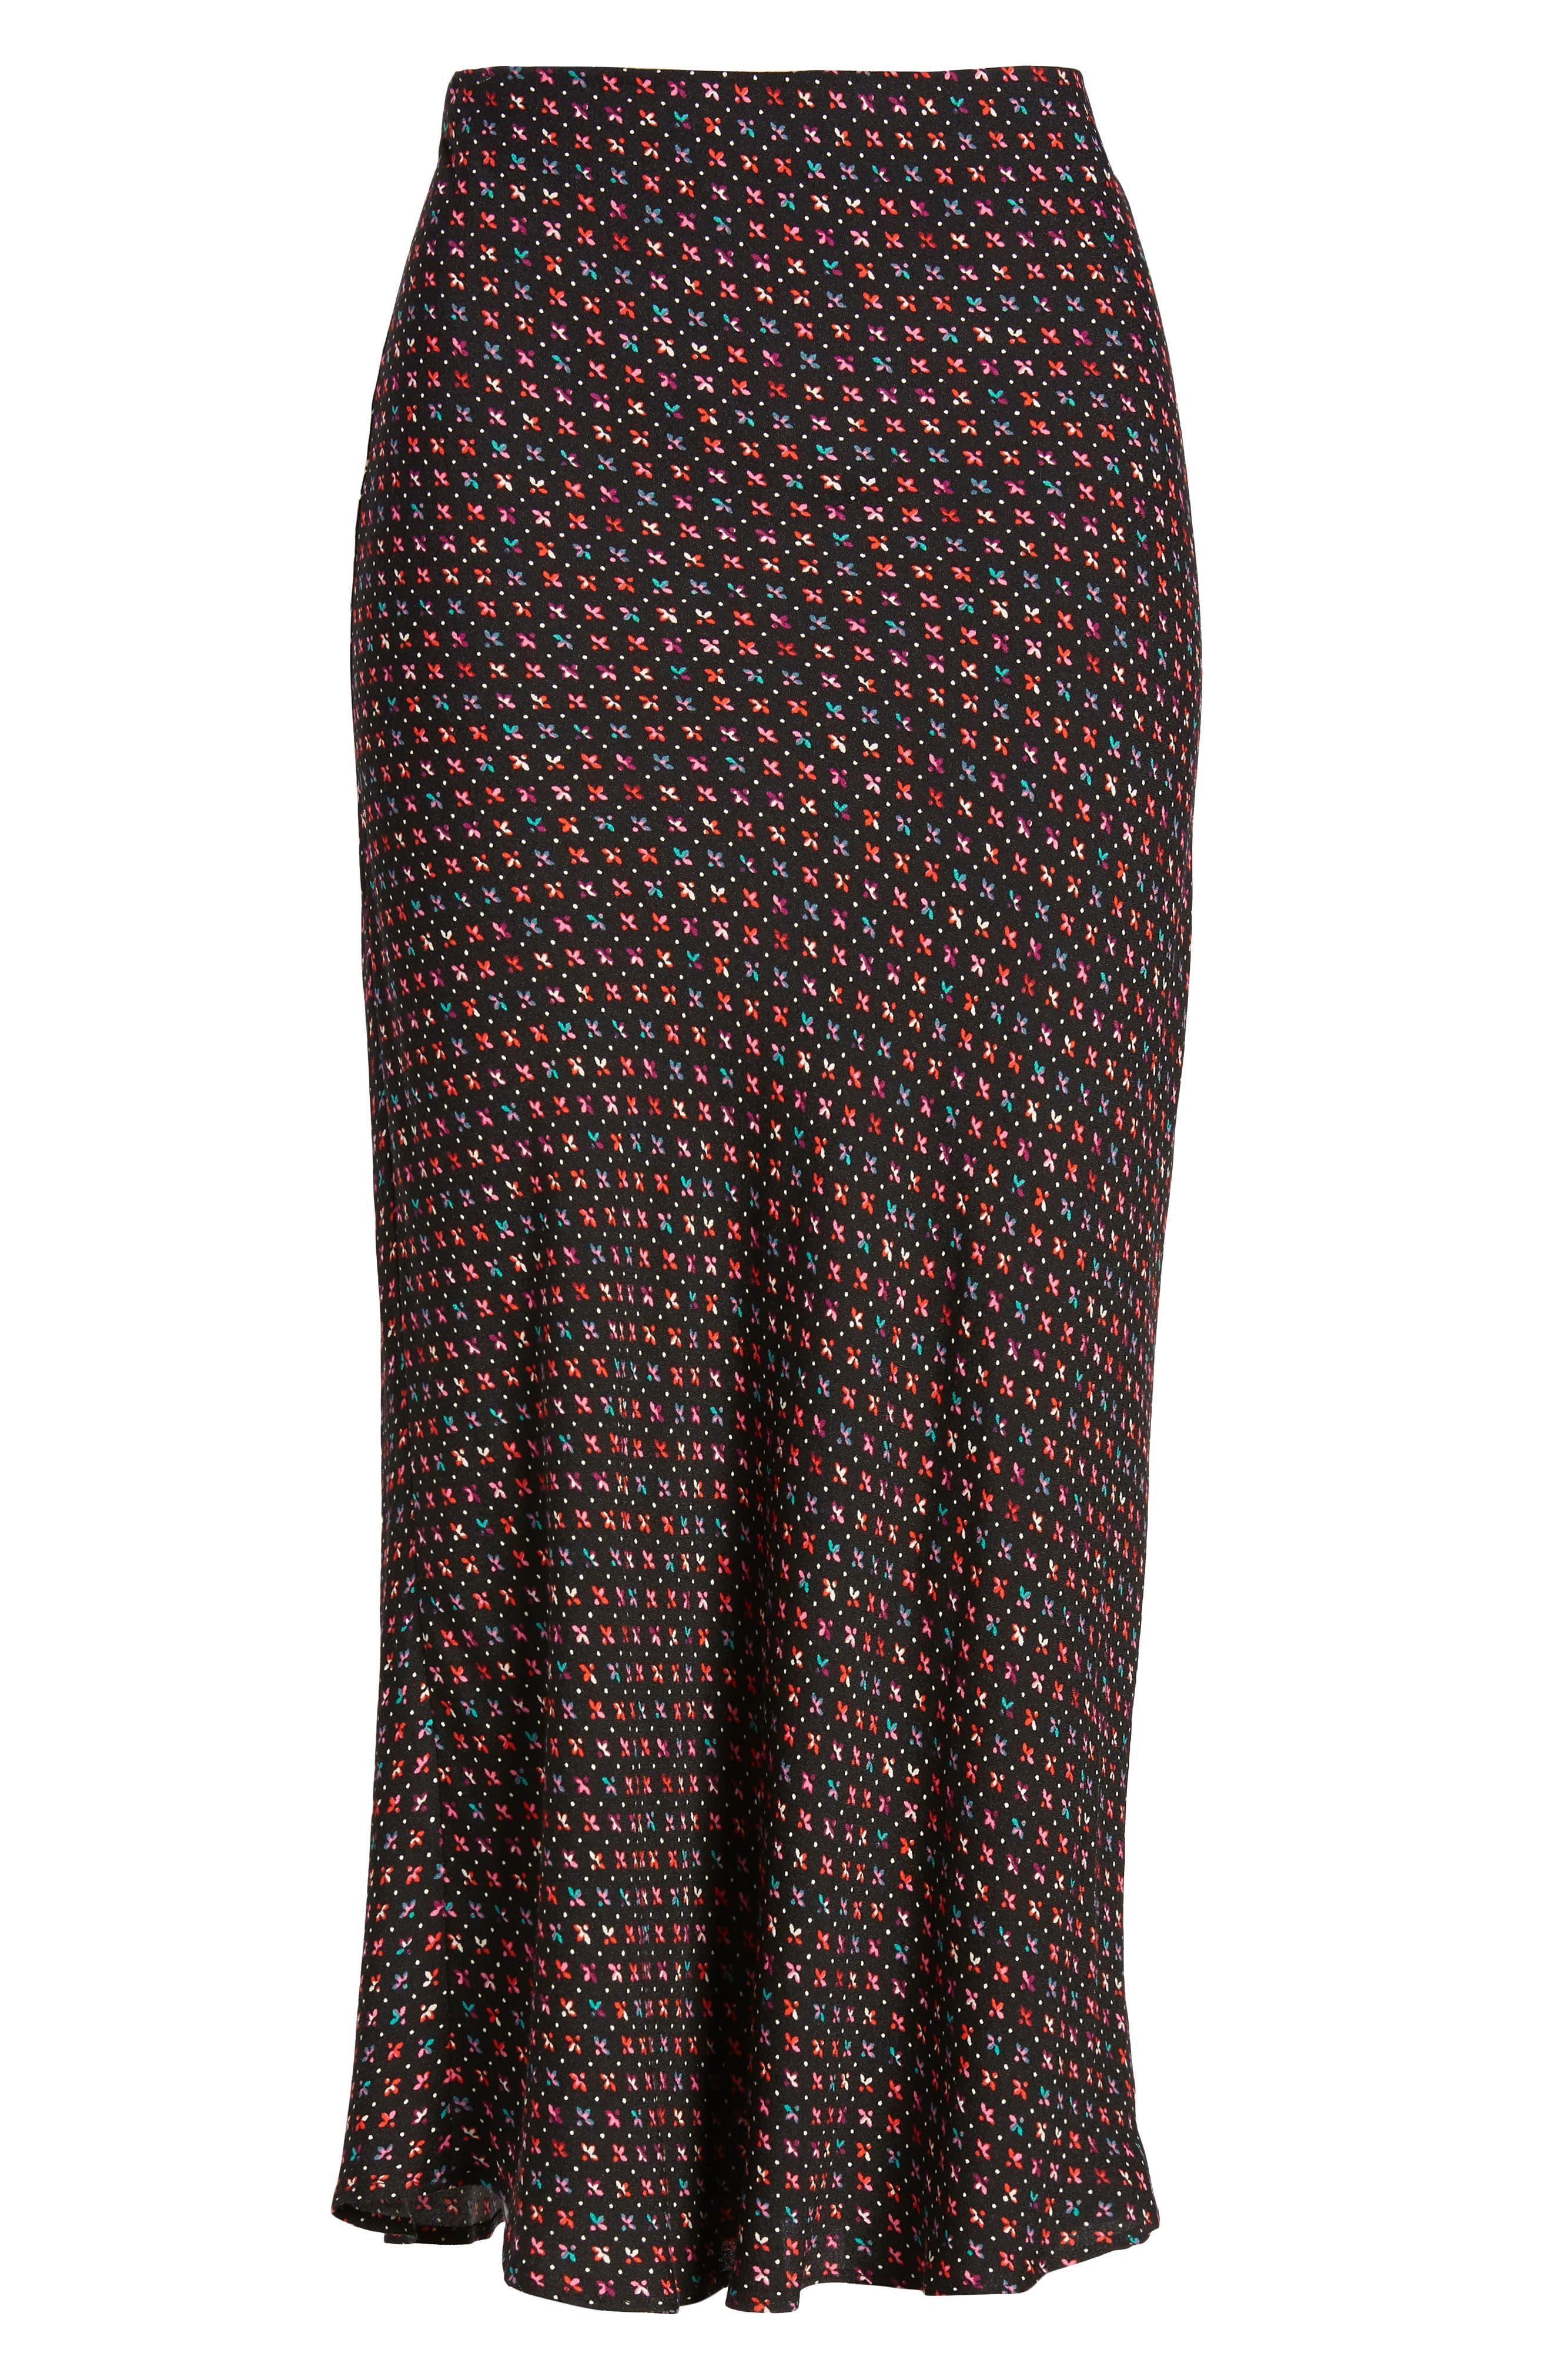 Brynne Print Midi Skirt,                             Alternate thumbnail 6, color,                             MULTI GEO